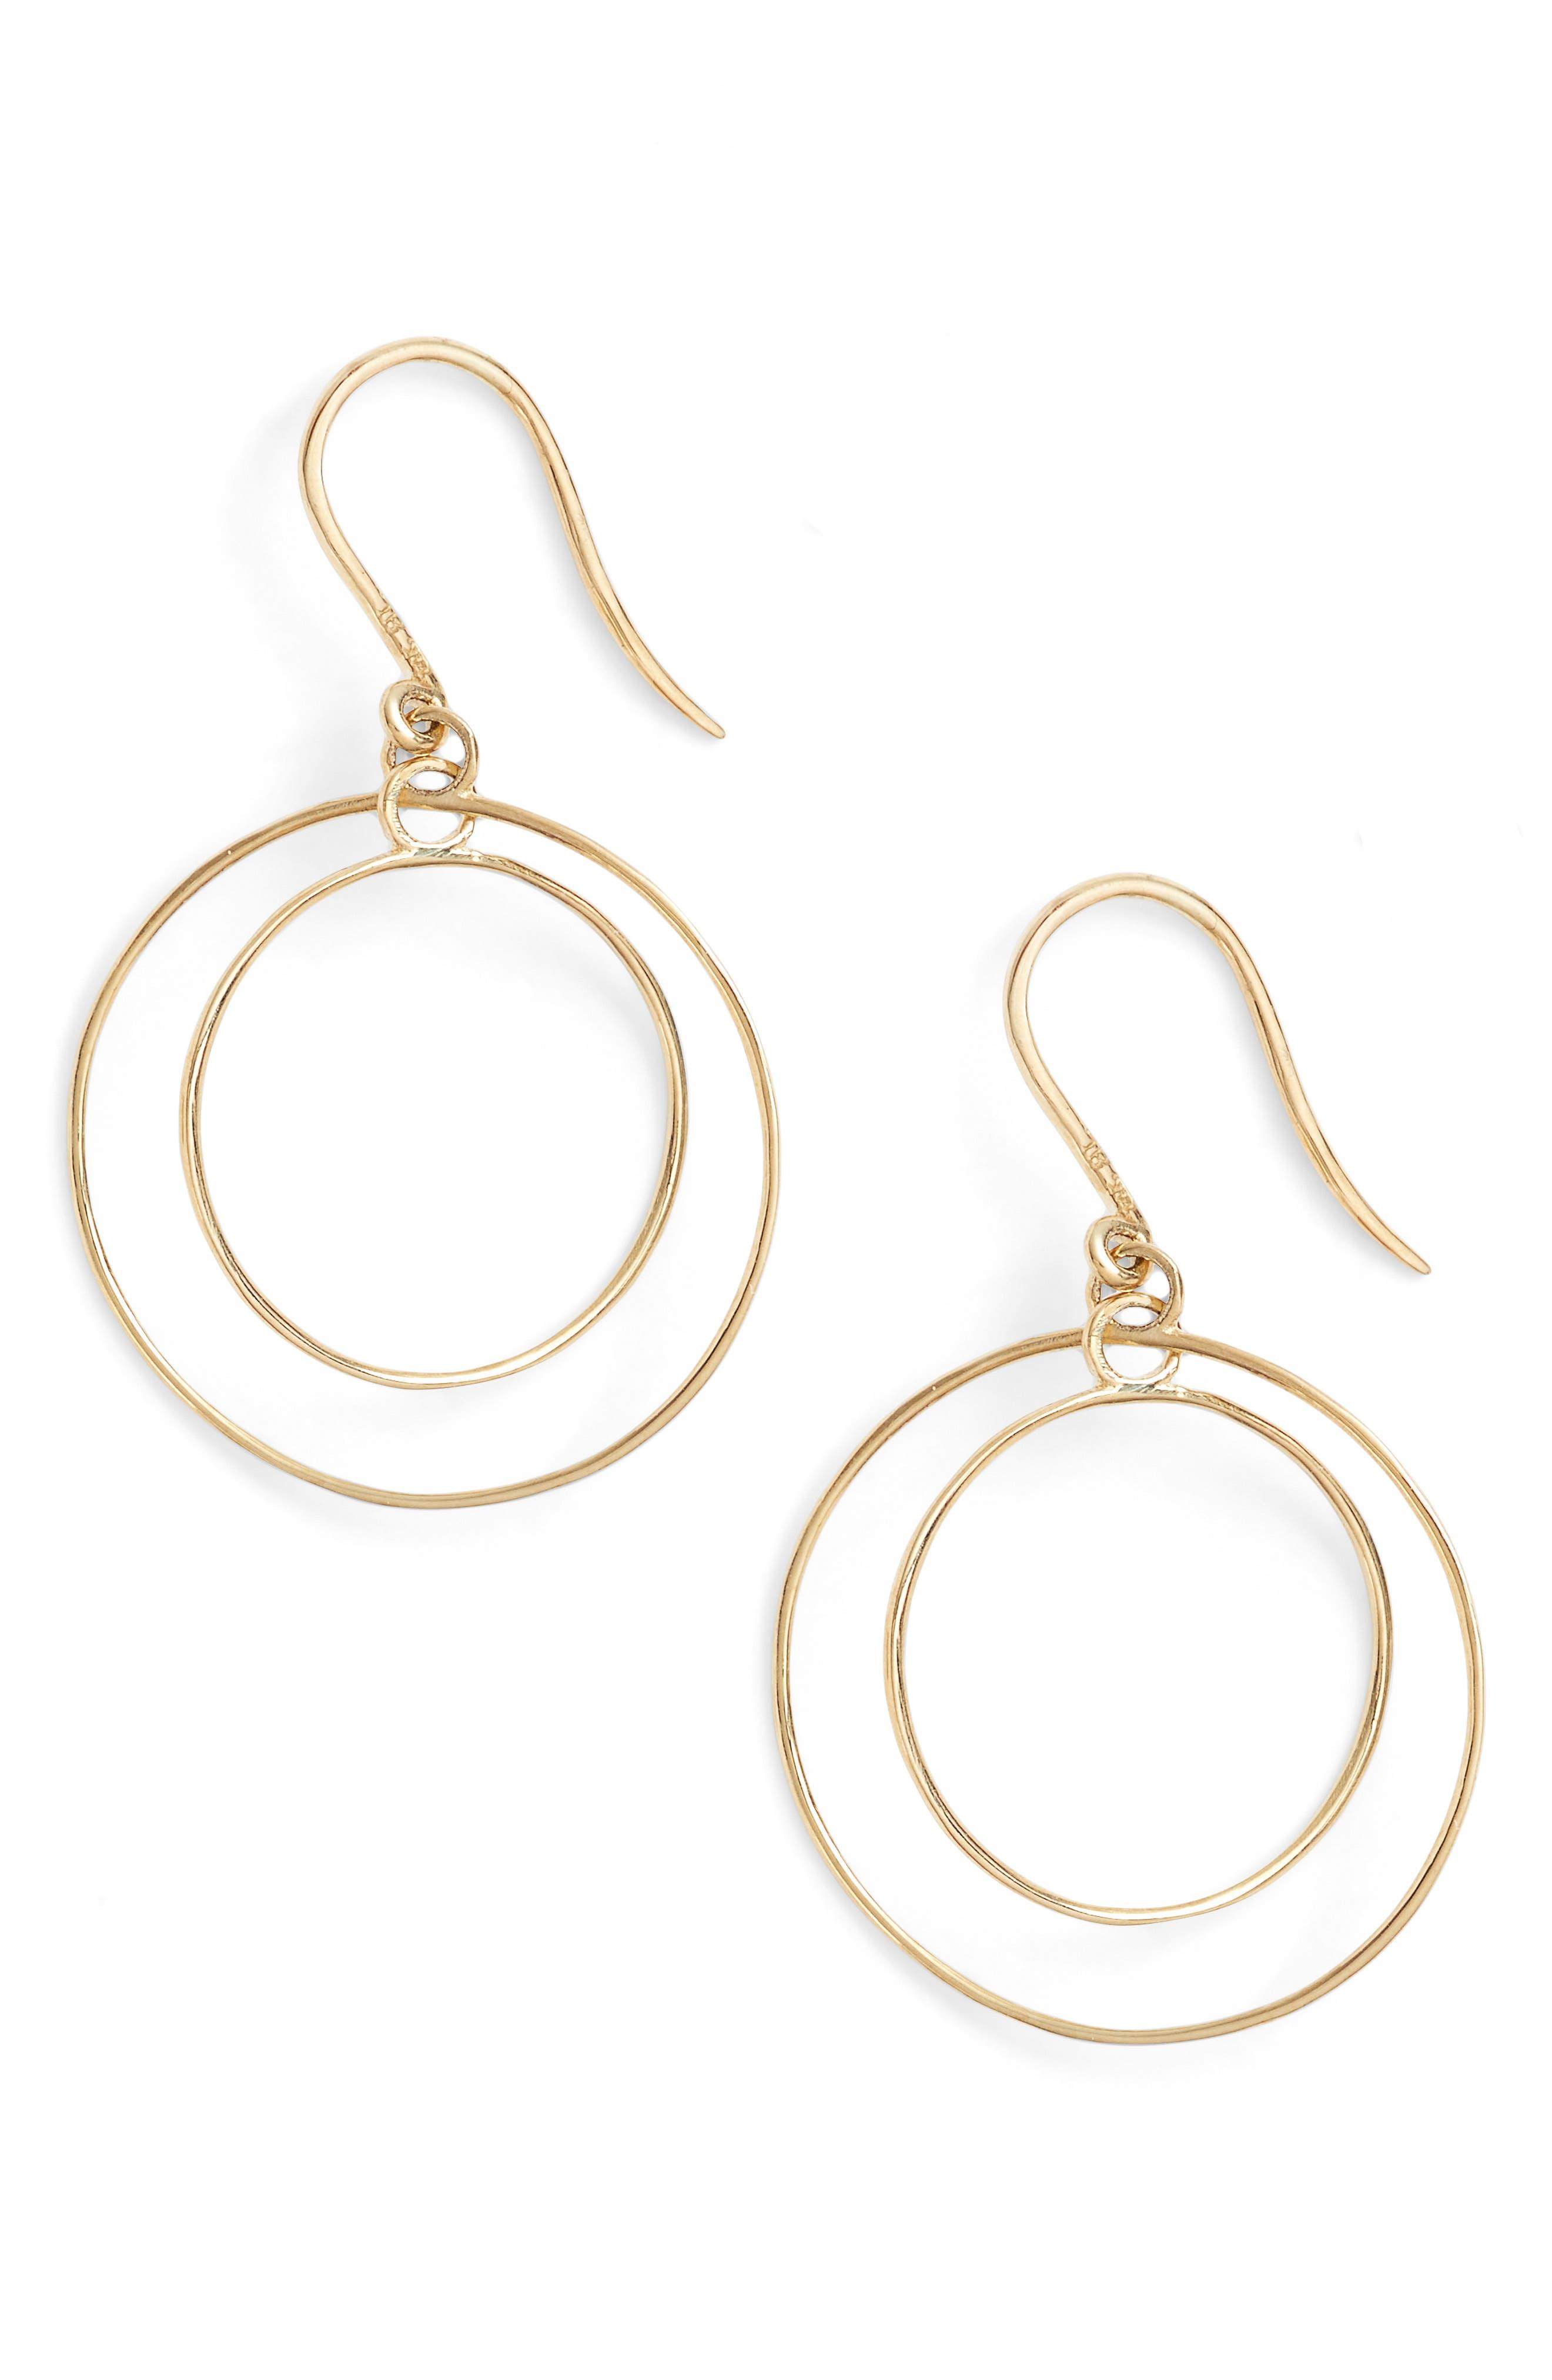 Double Circle Orbital Drop Earrings,                             Main thumbnail 1, color,                             YELLOW GOLD